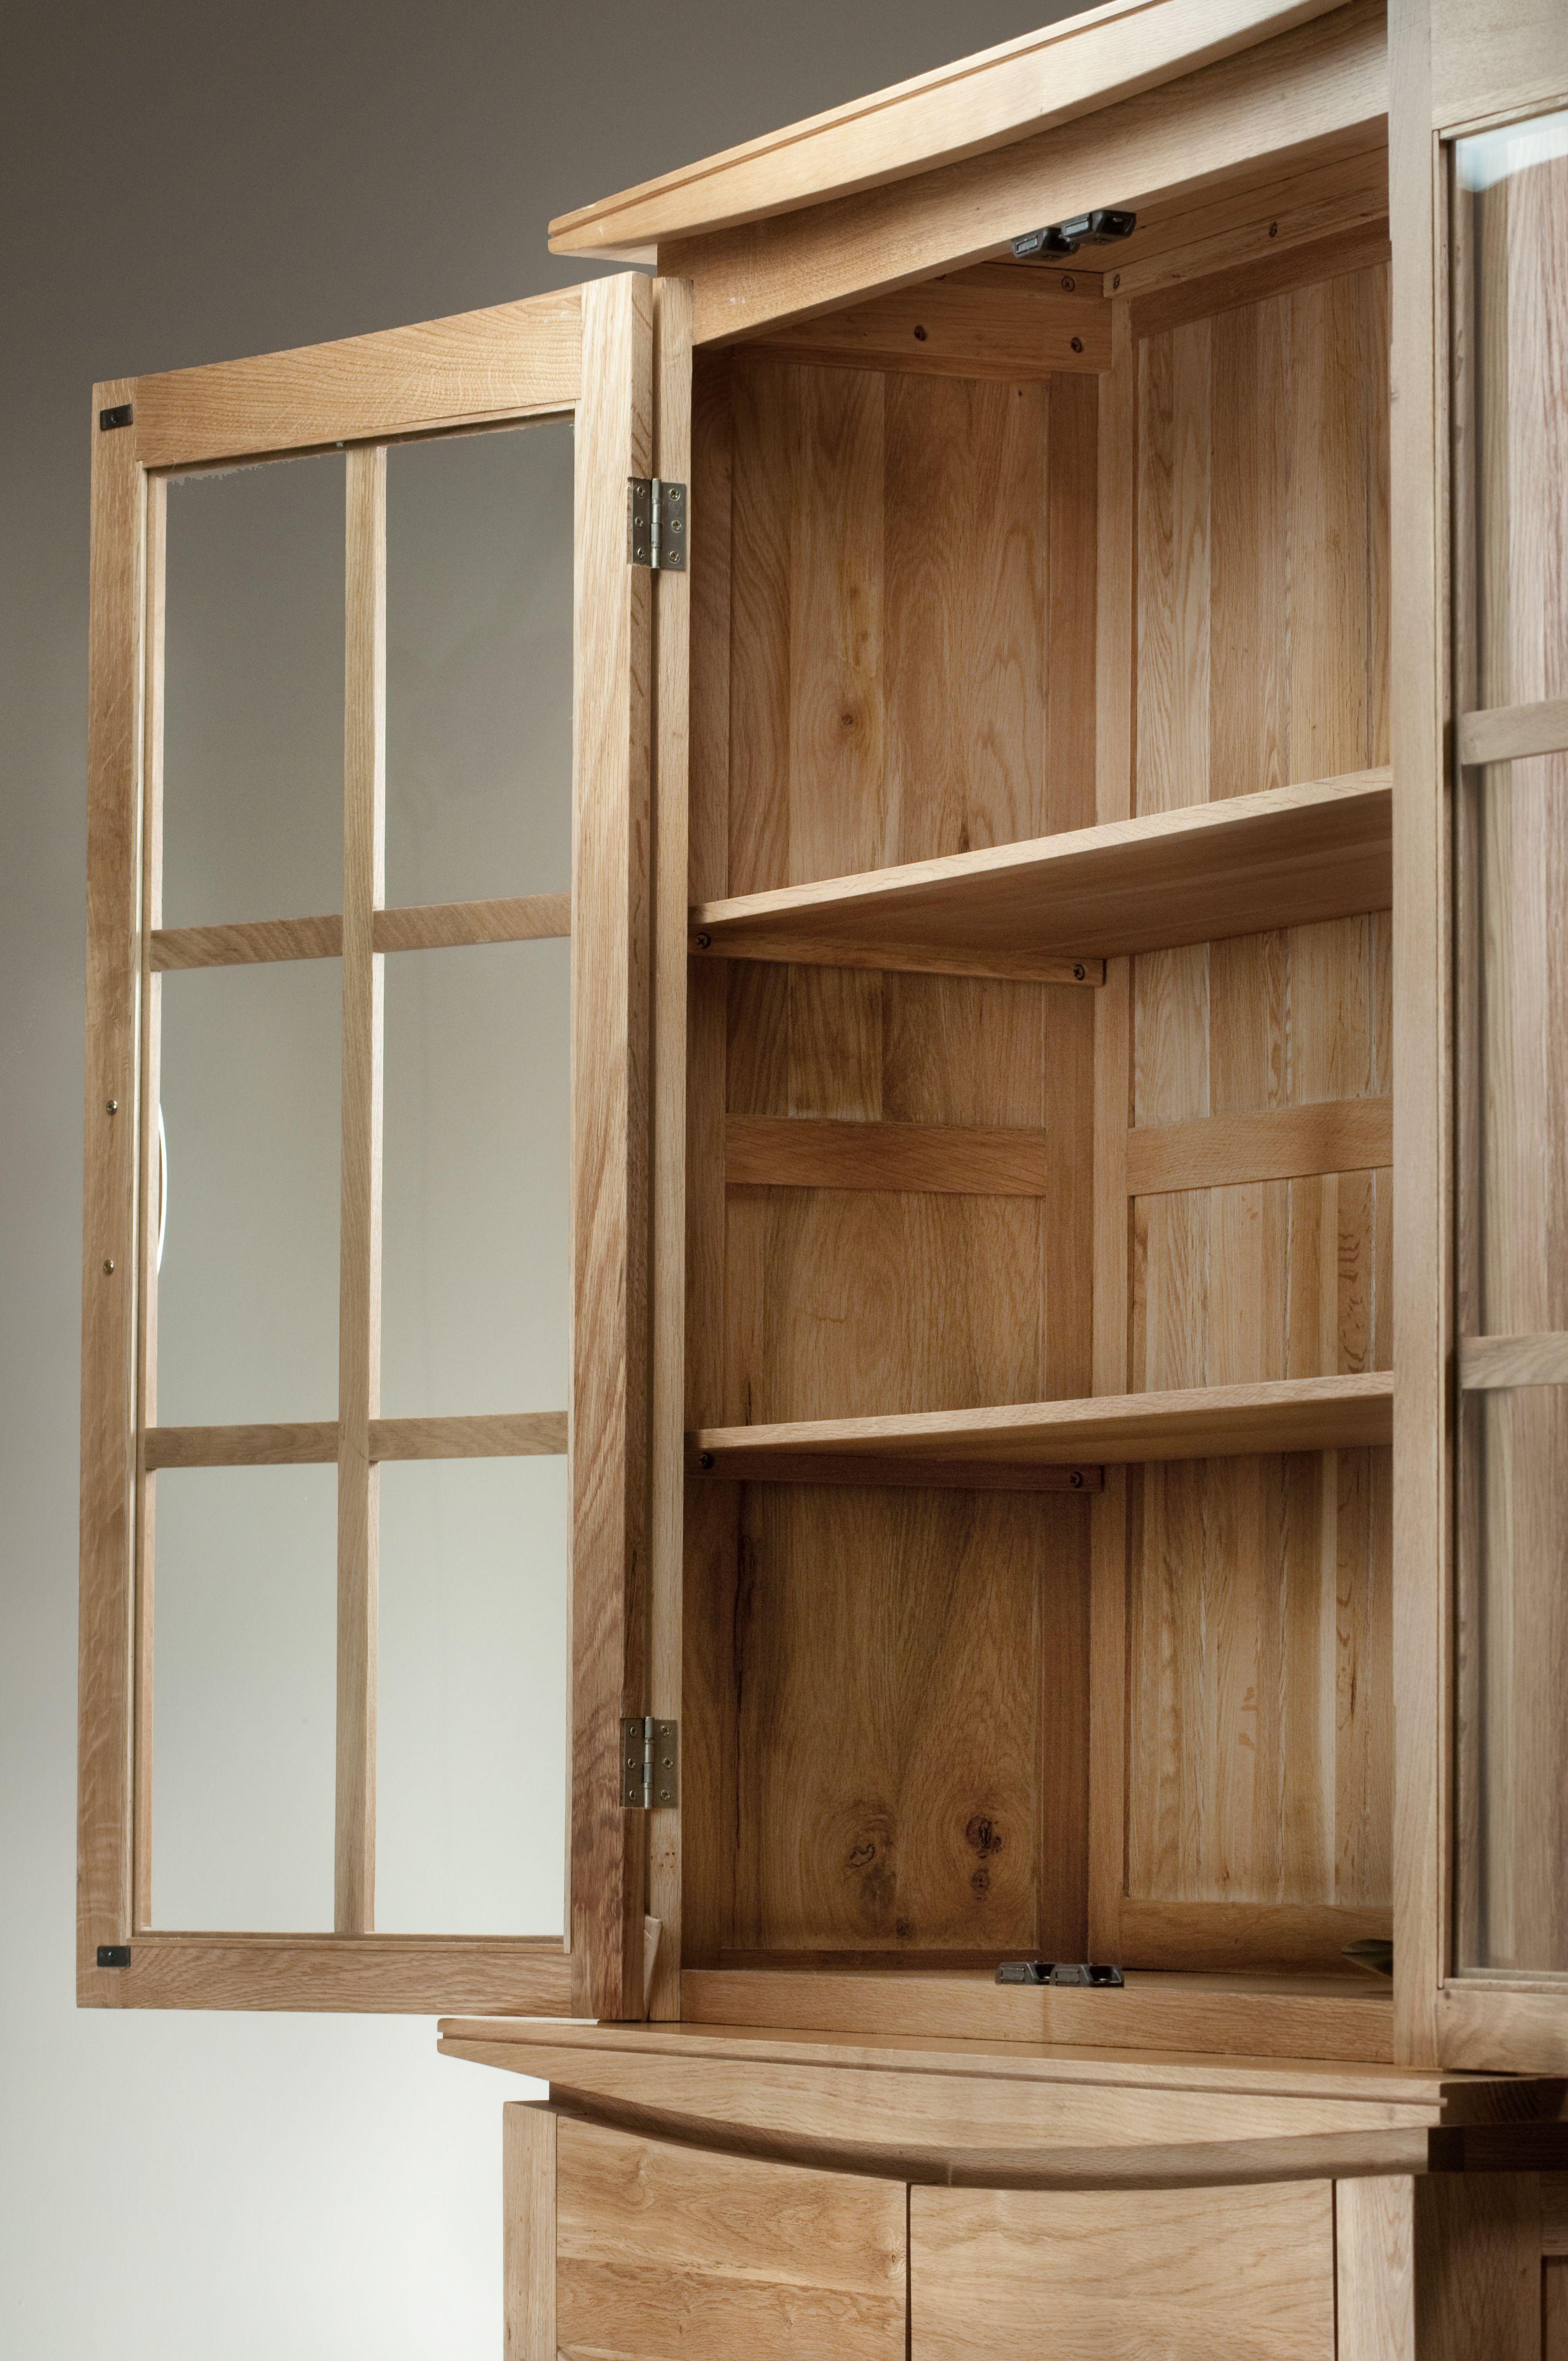 Tokyo Solid Oak Dresser Cabinet www.oakfurnitureland.co.uk